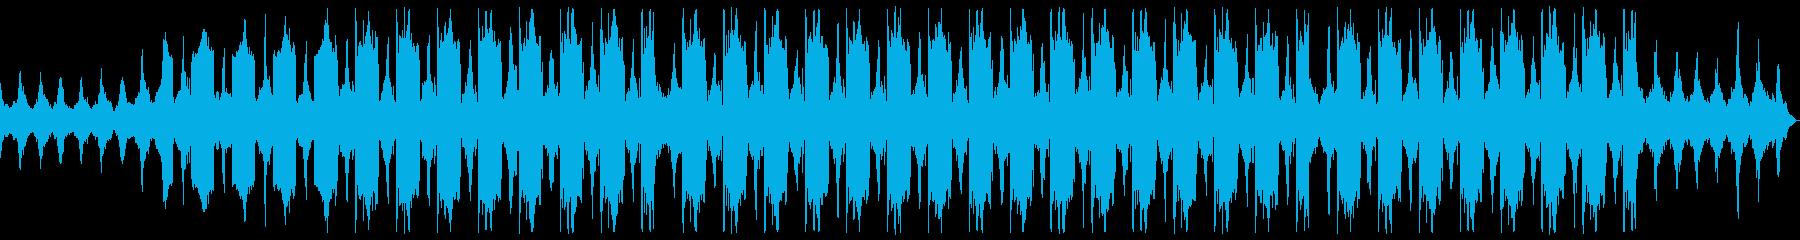 NY/UK Drill系ビートの再生済みの波形